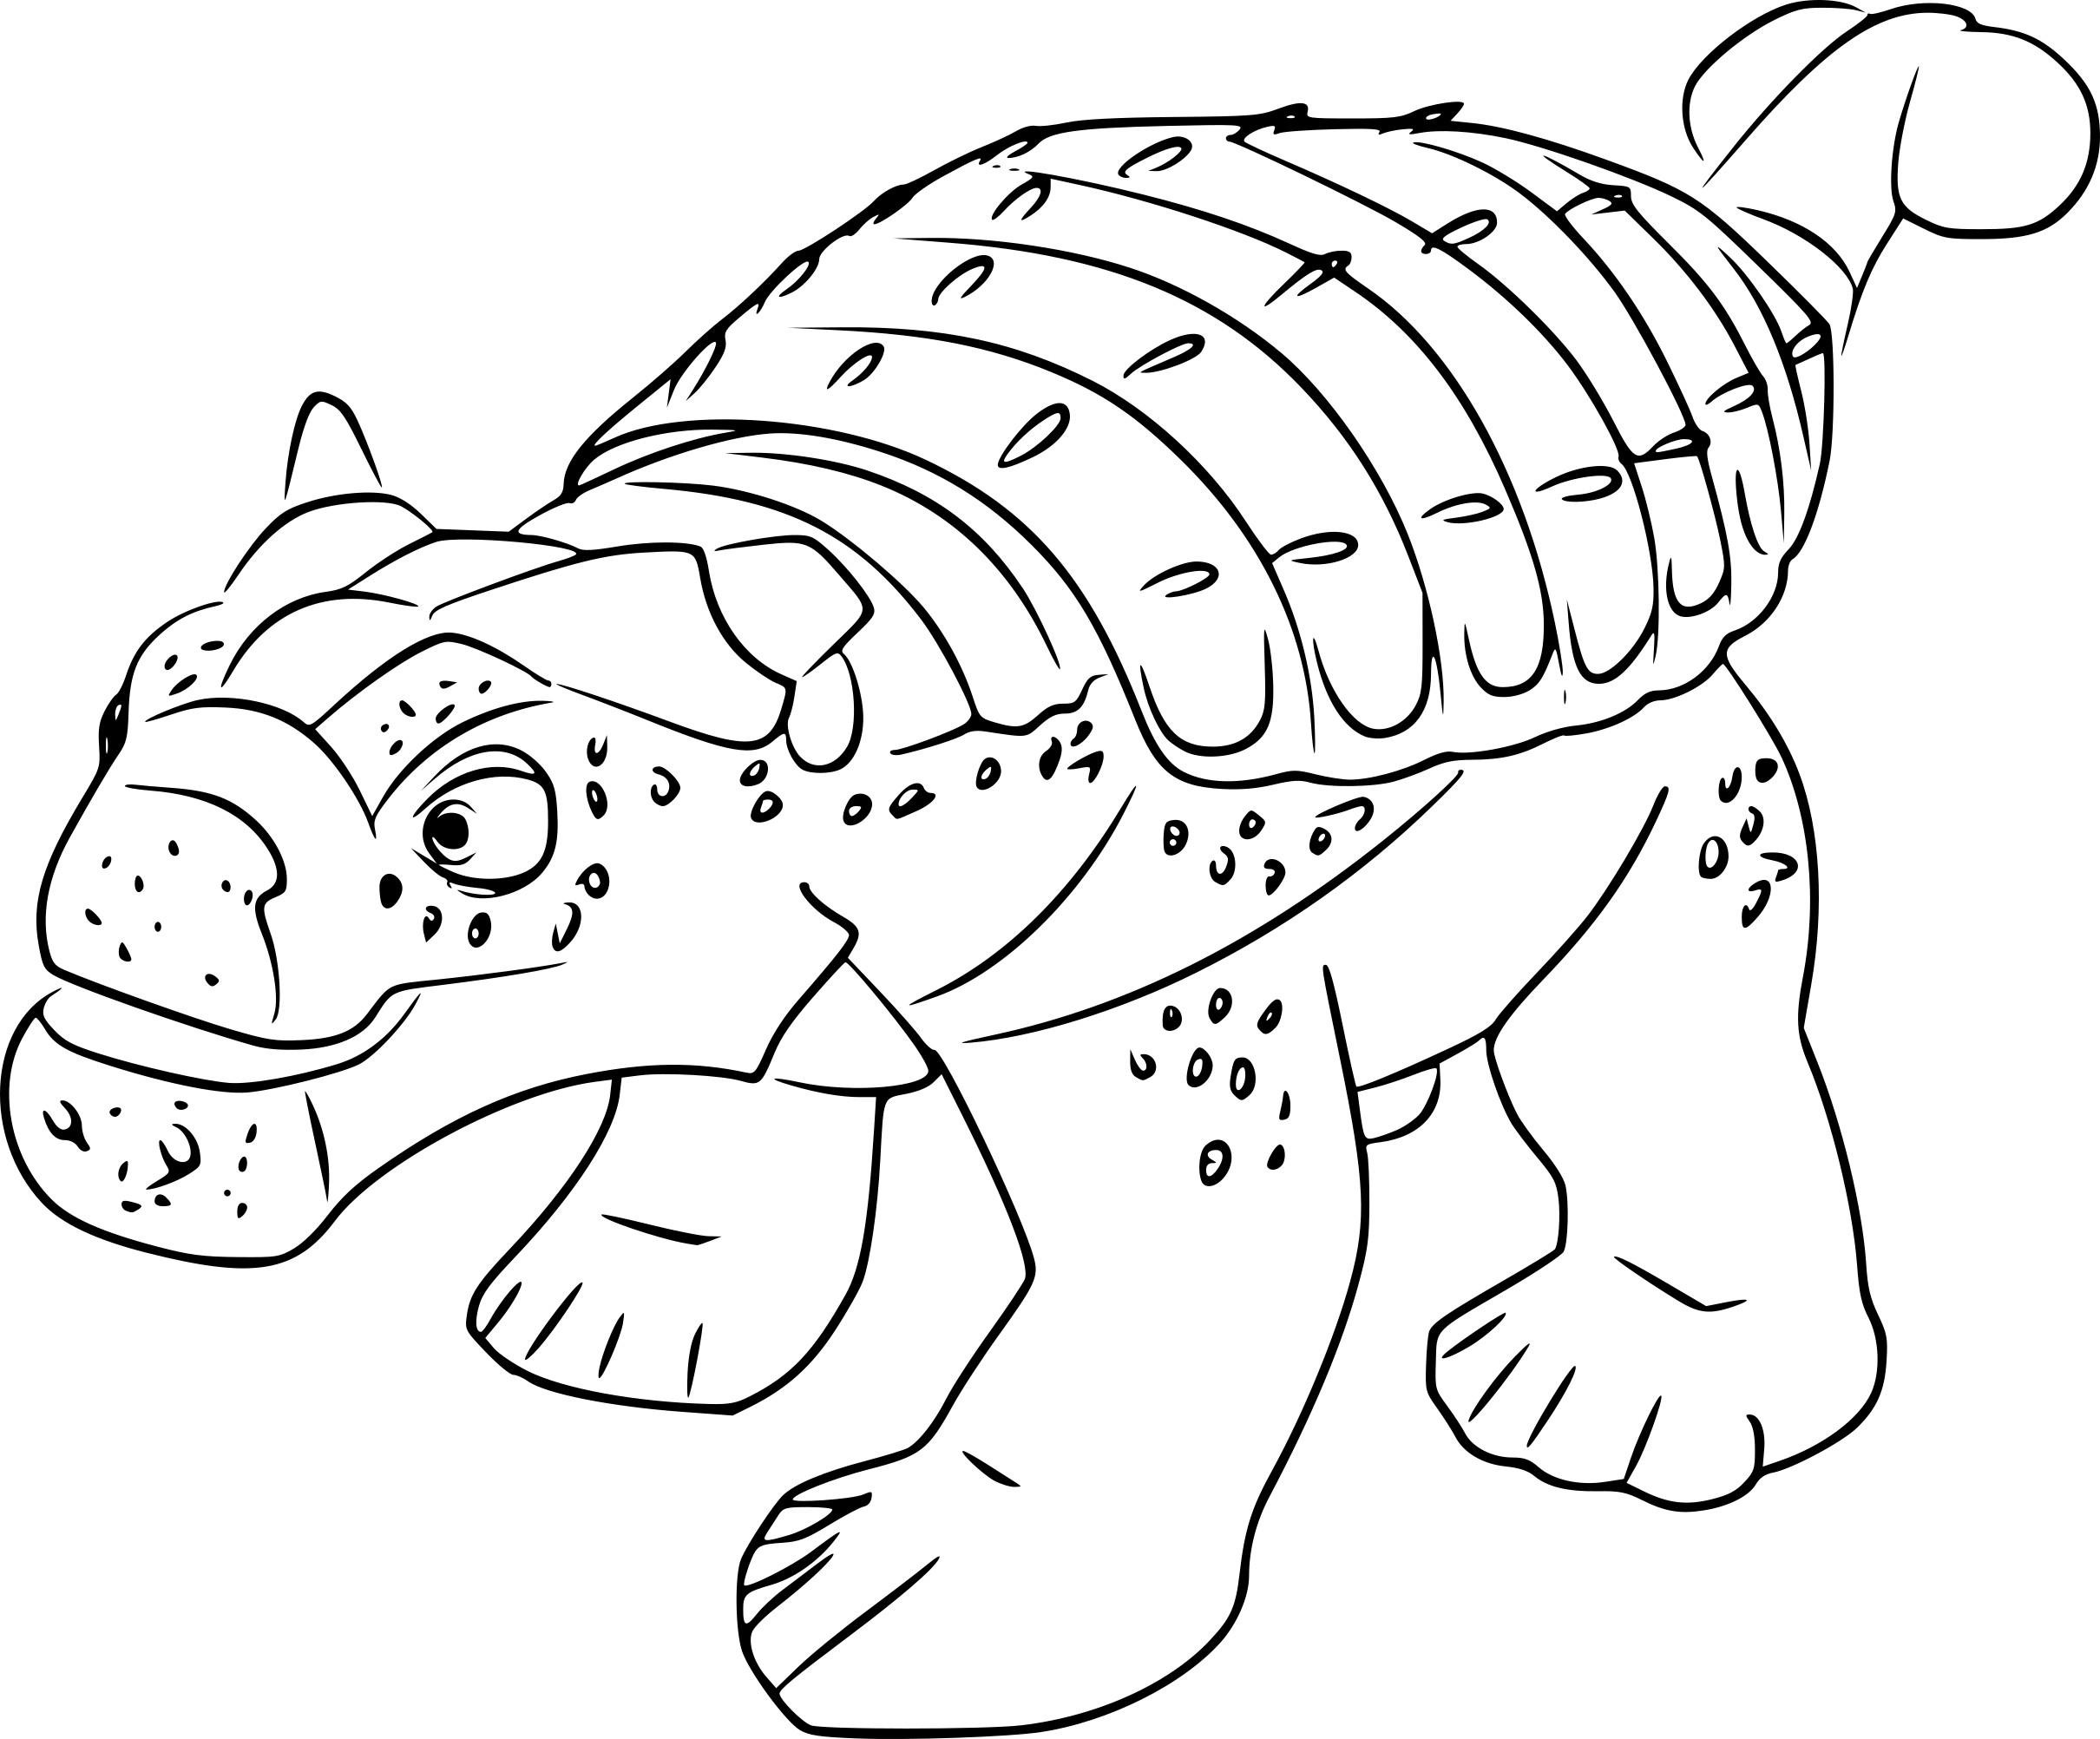 Coloriage ankylosaurus dinosaure imprimer - Dessin de dinosaure a imprimer ...